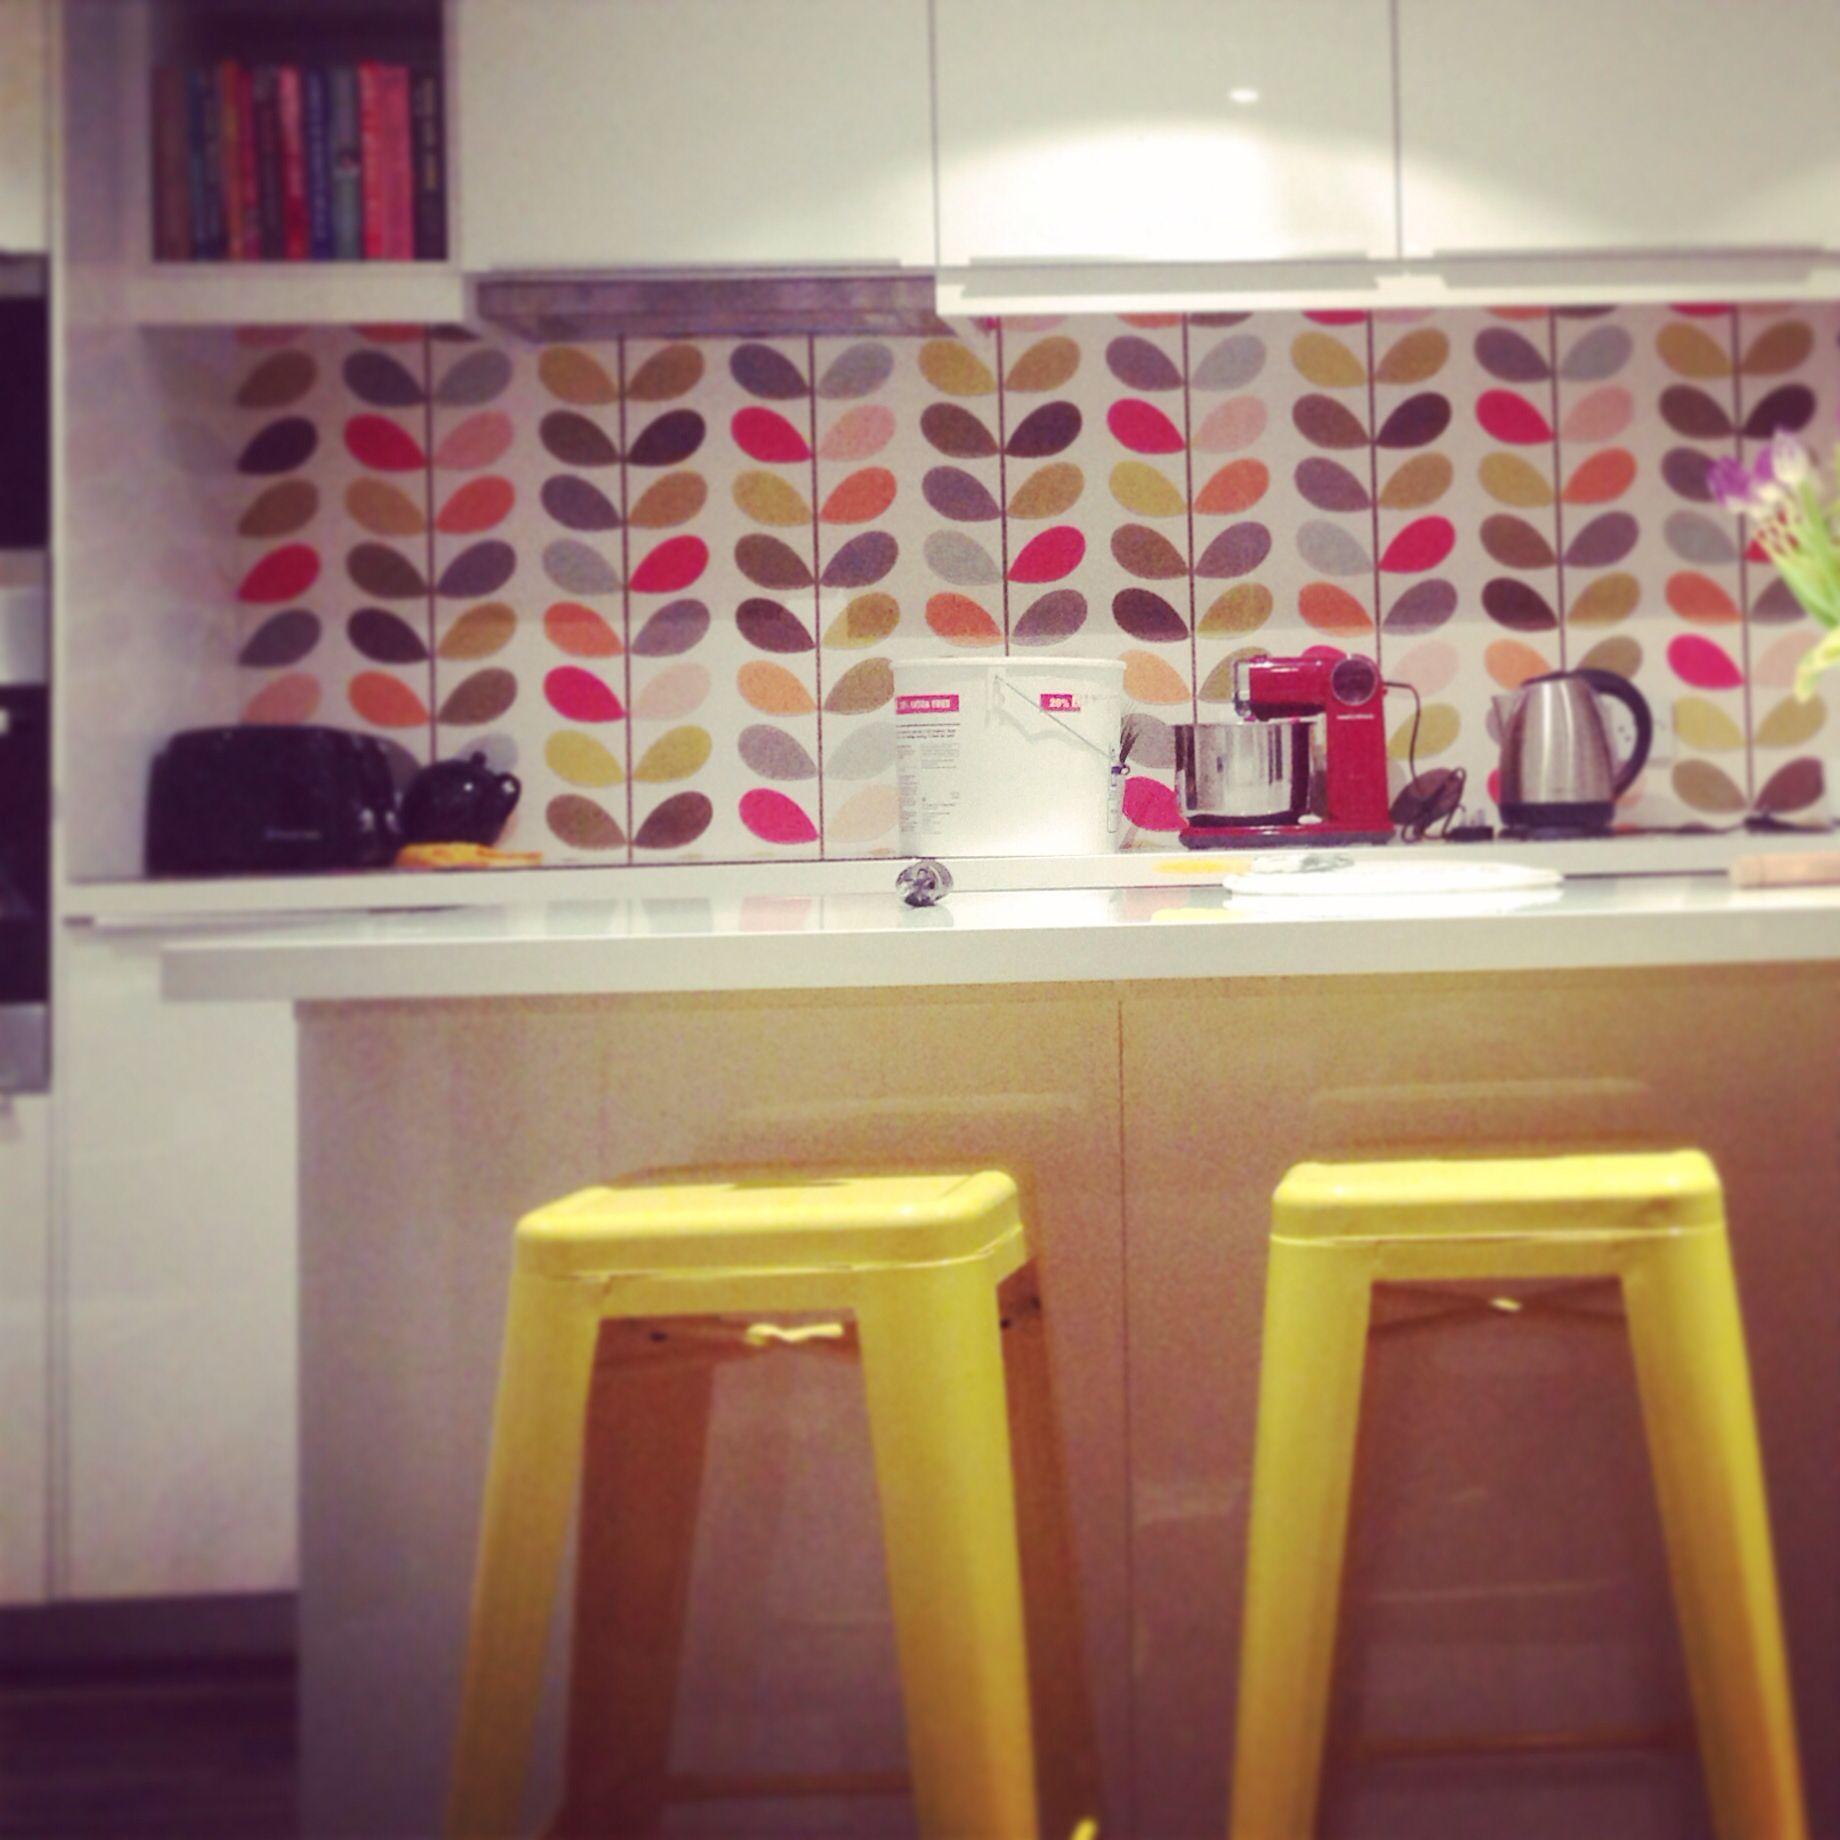 Orla kiely linear stem wallpaper -  Orla Kiely Multi Stem Wallpaper White Gloss Kitchen Yellow